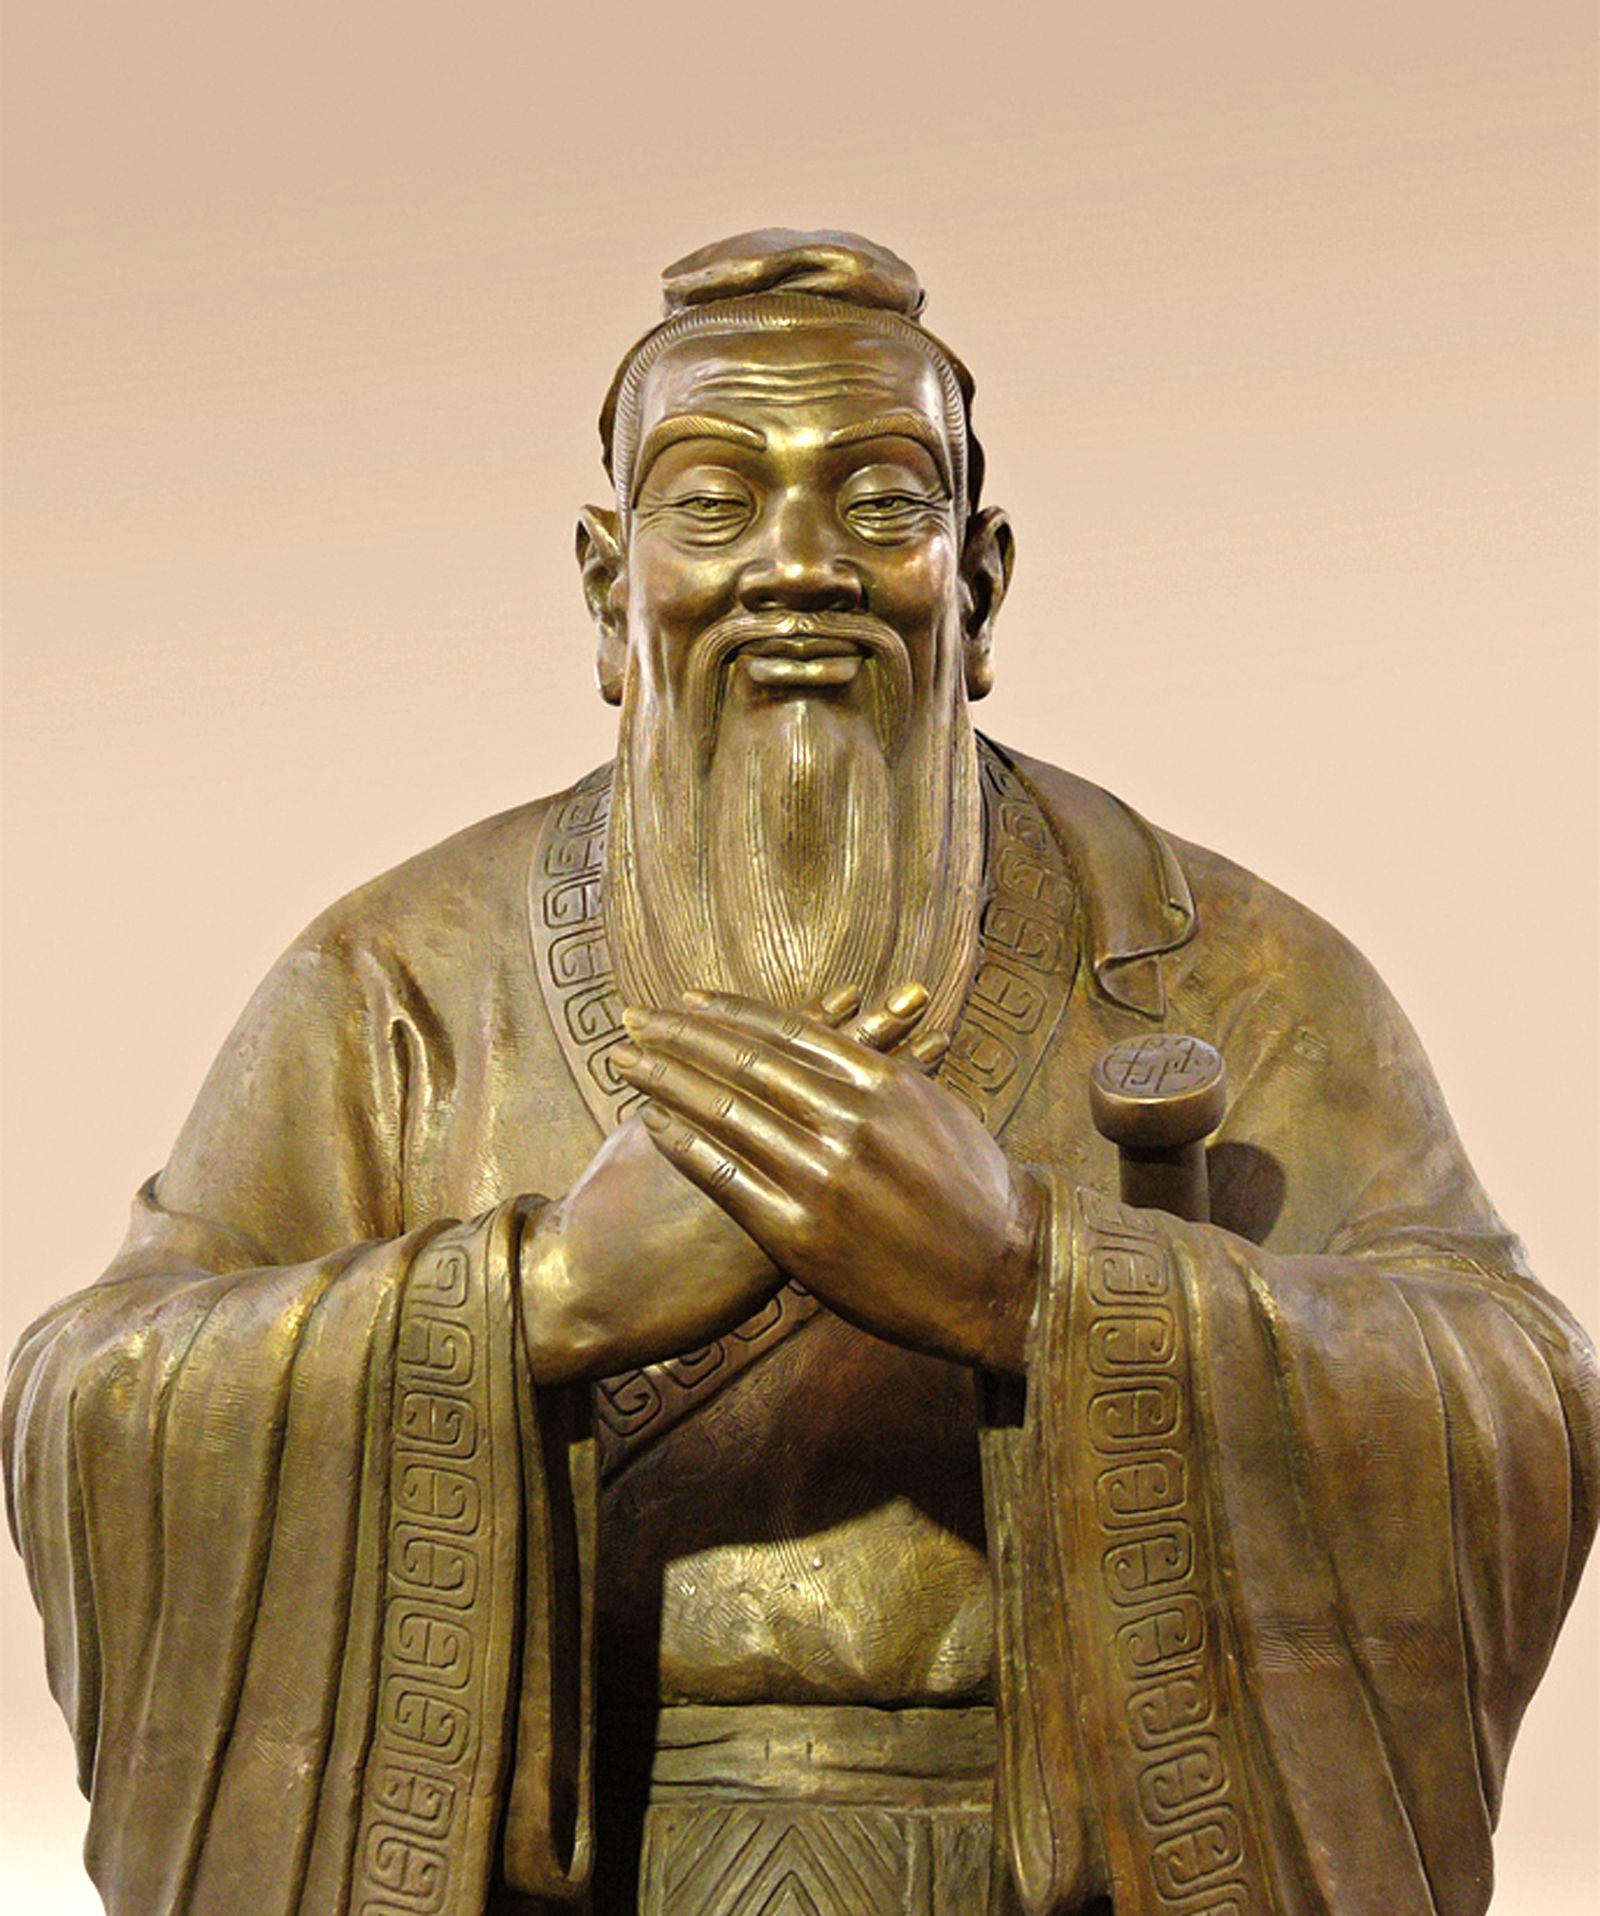 Statue des Konfuzius